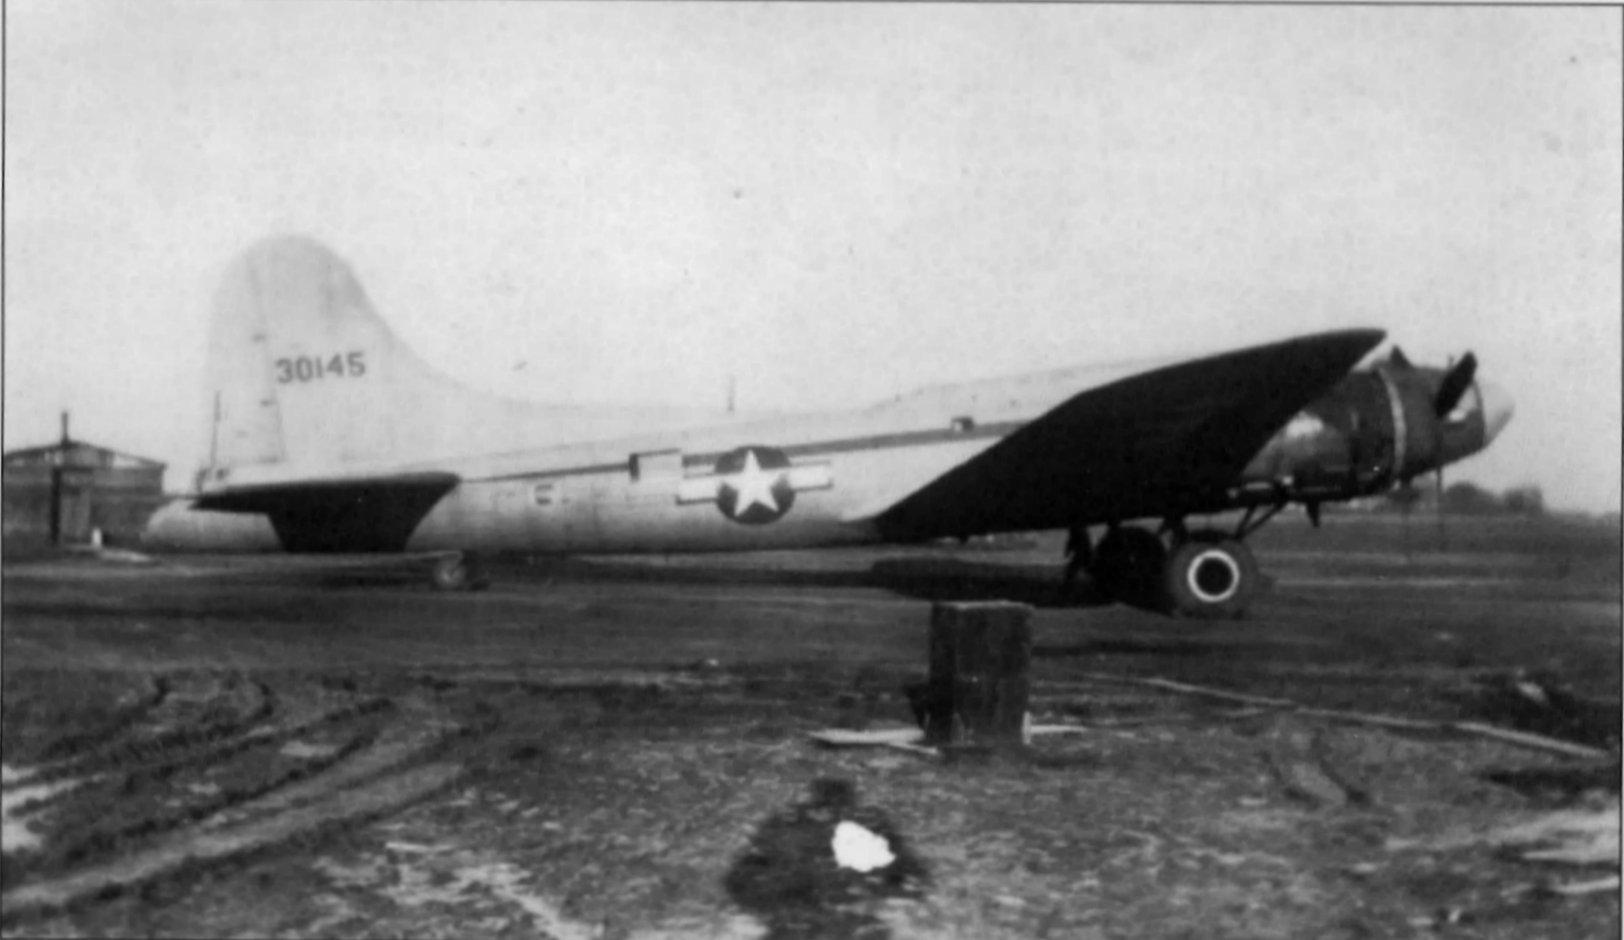 B-17 42-30145